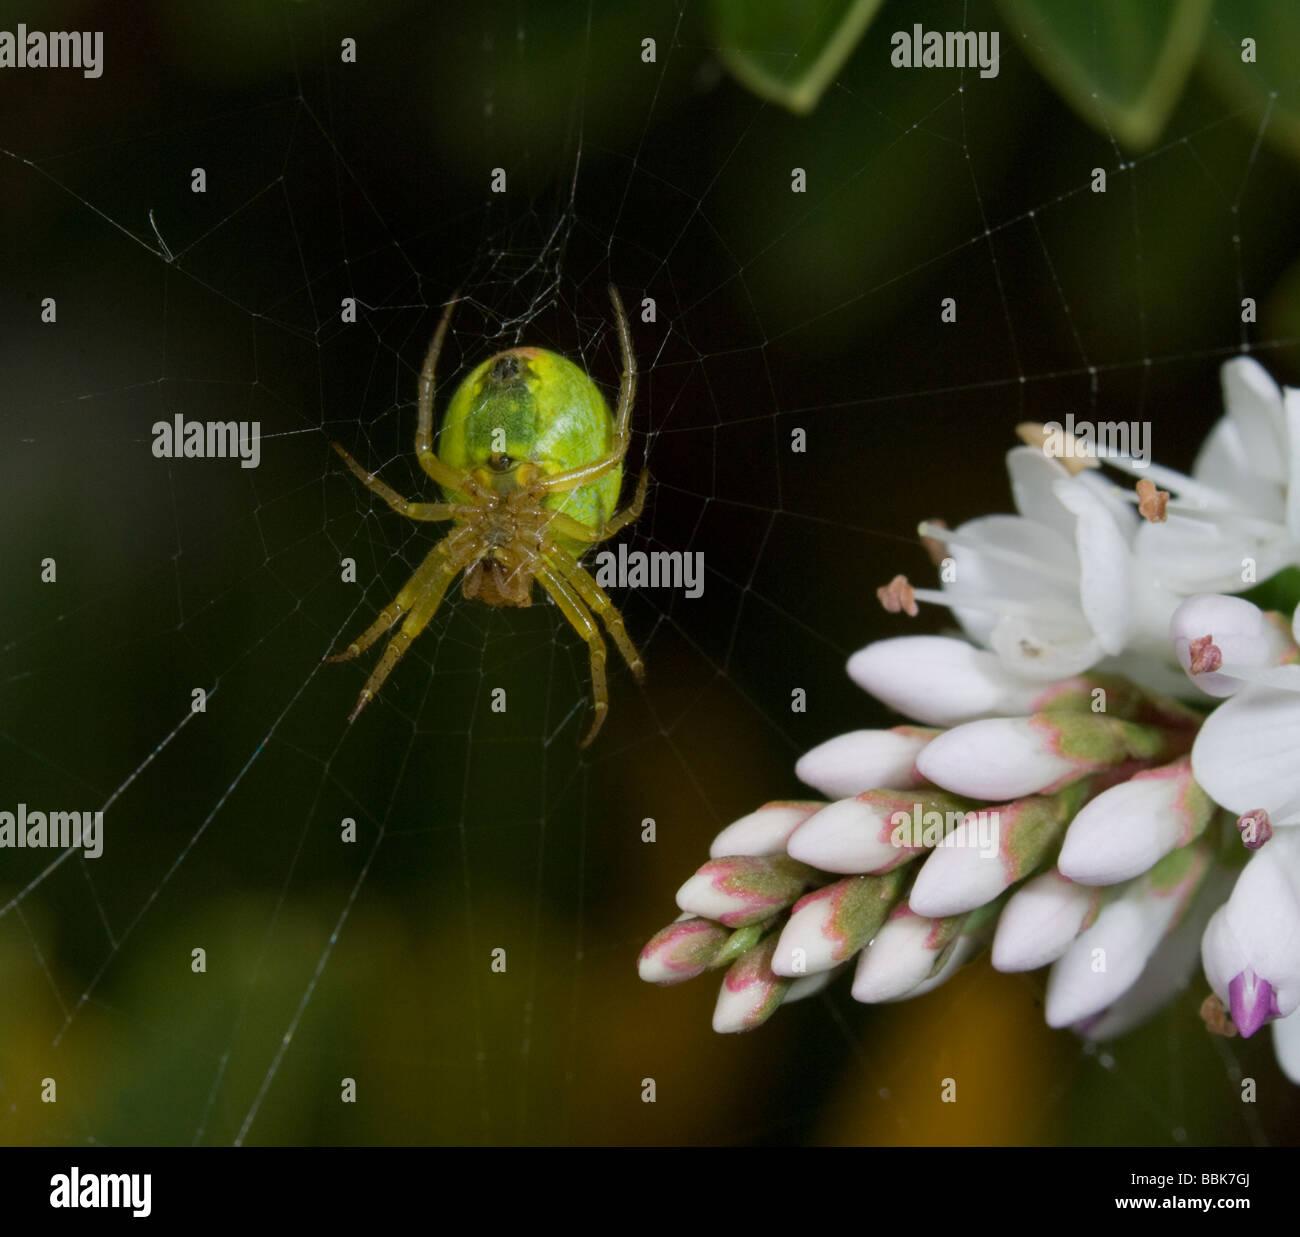 Cucumber green spider (Araniella cucurbitina), UK - Stock Image